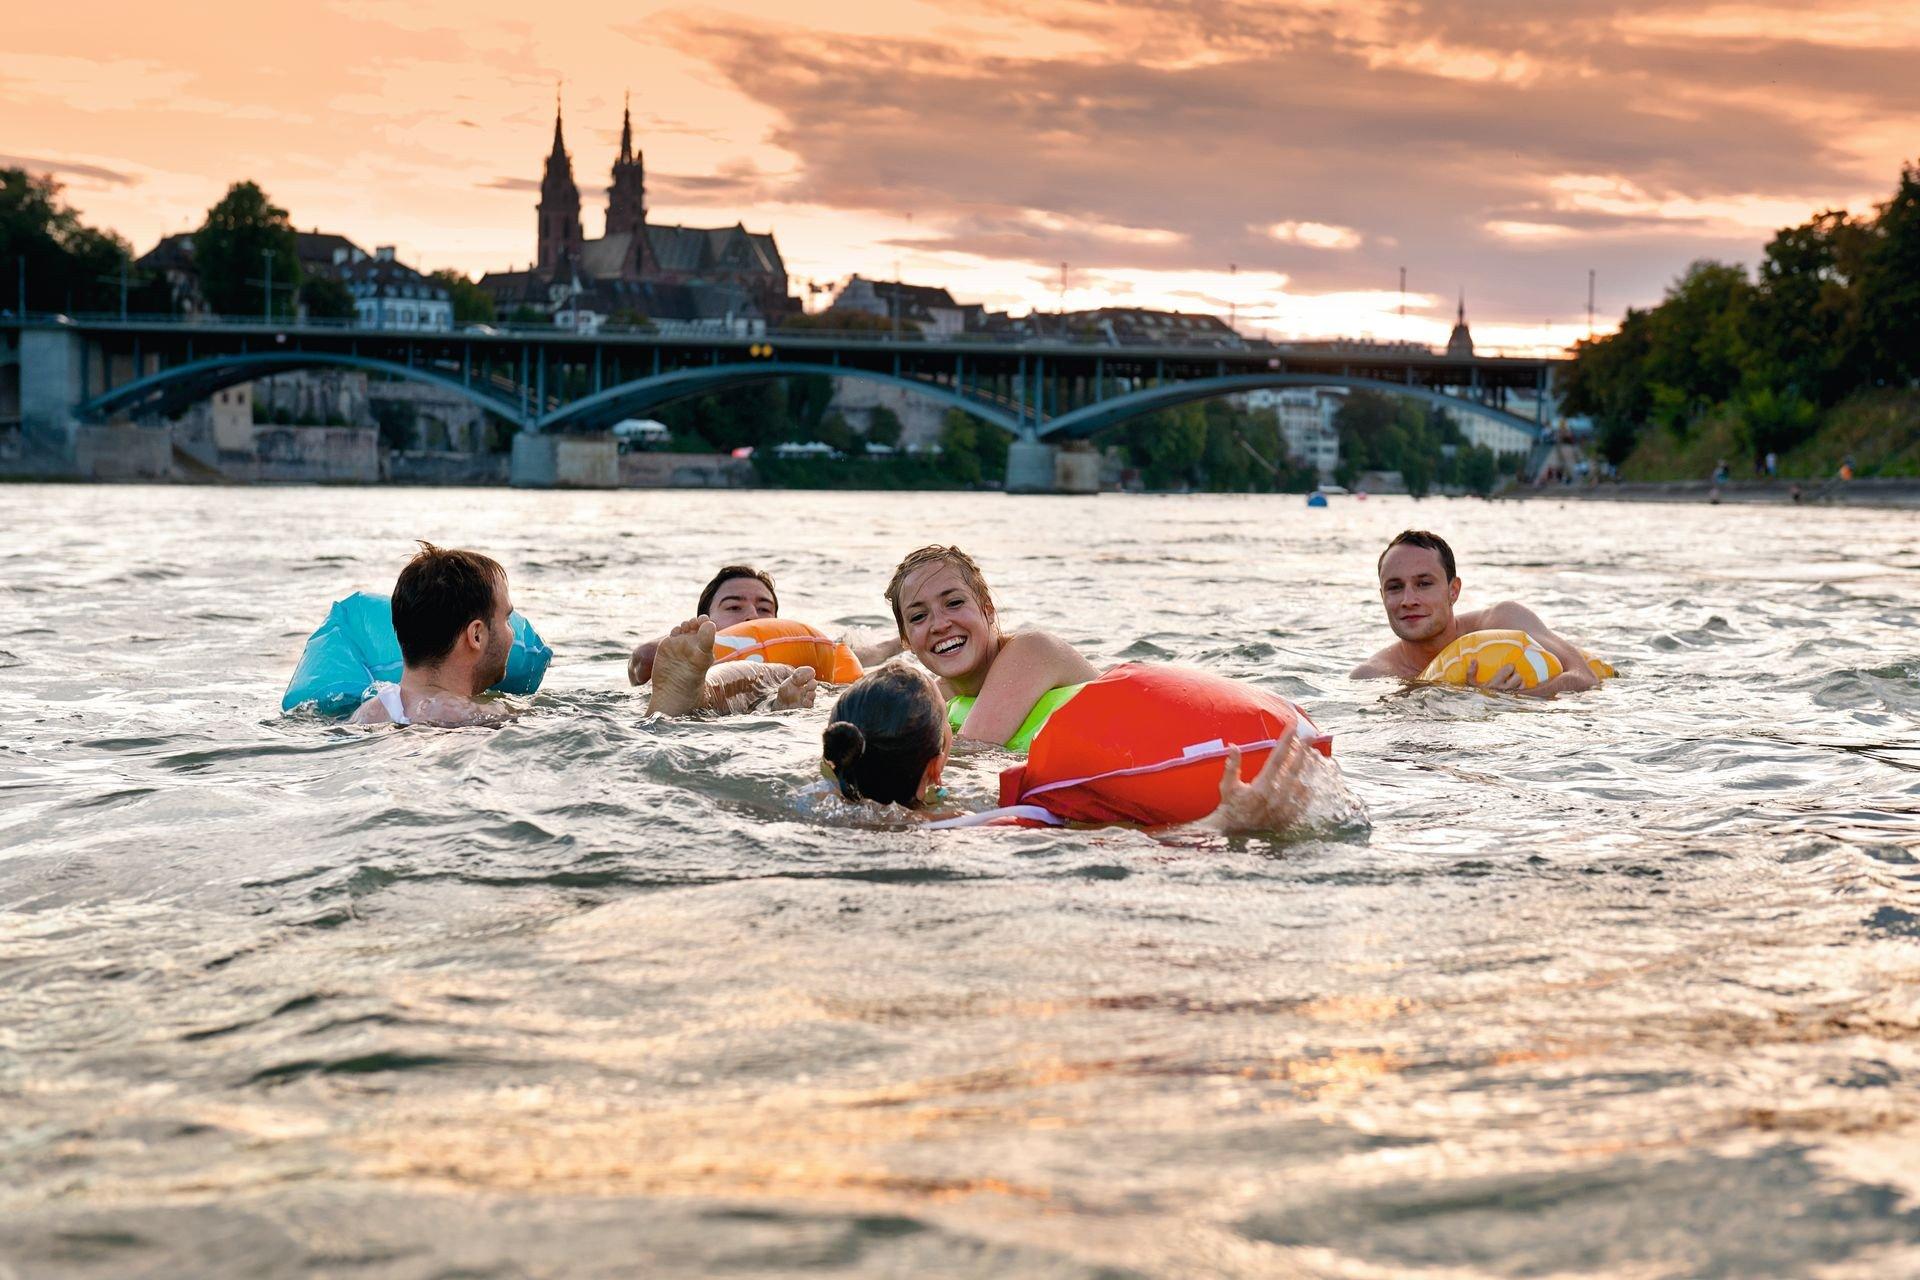 Rheinschwimmen Basel / Swimming in the Rhine